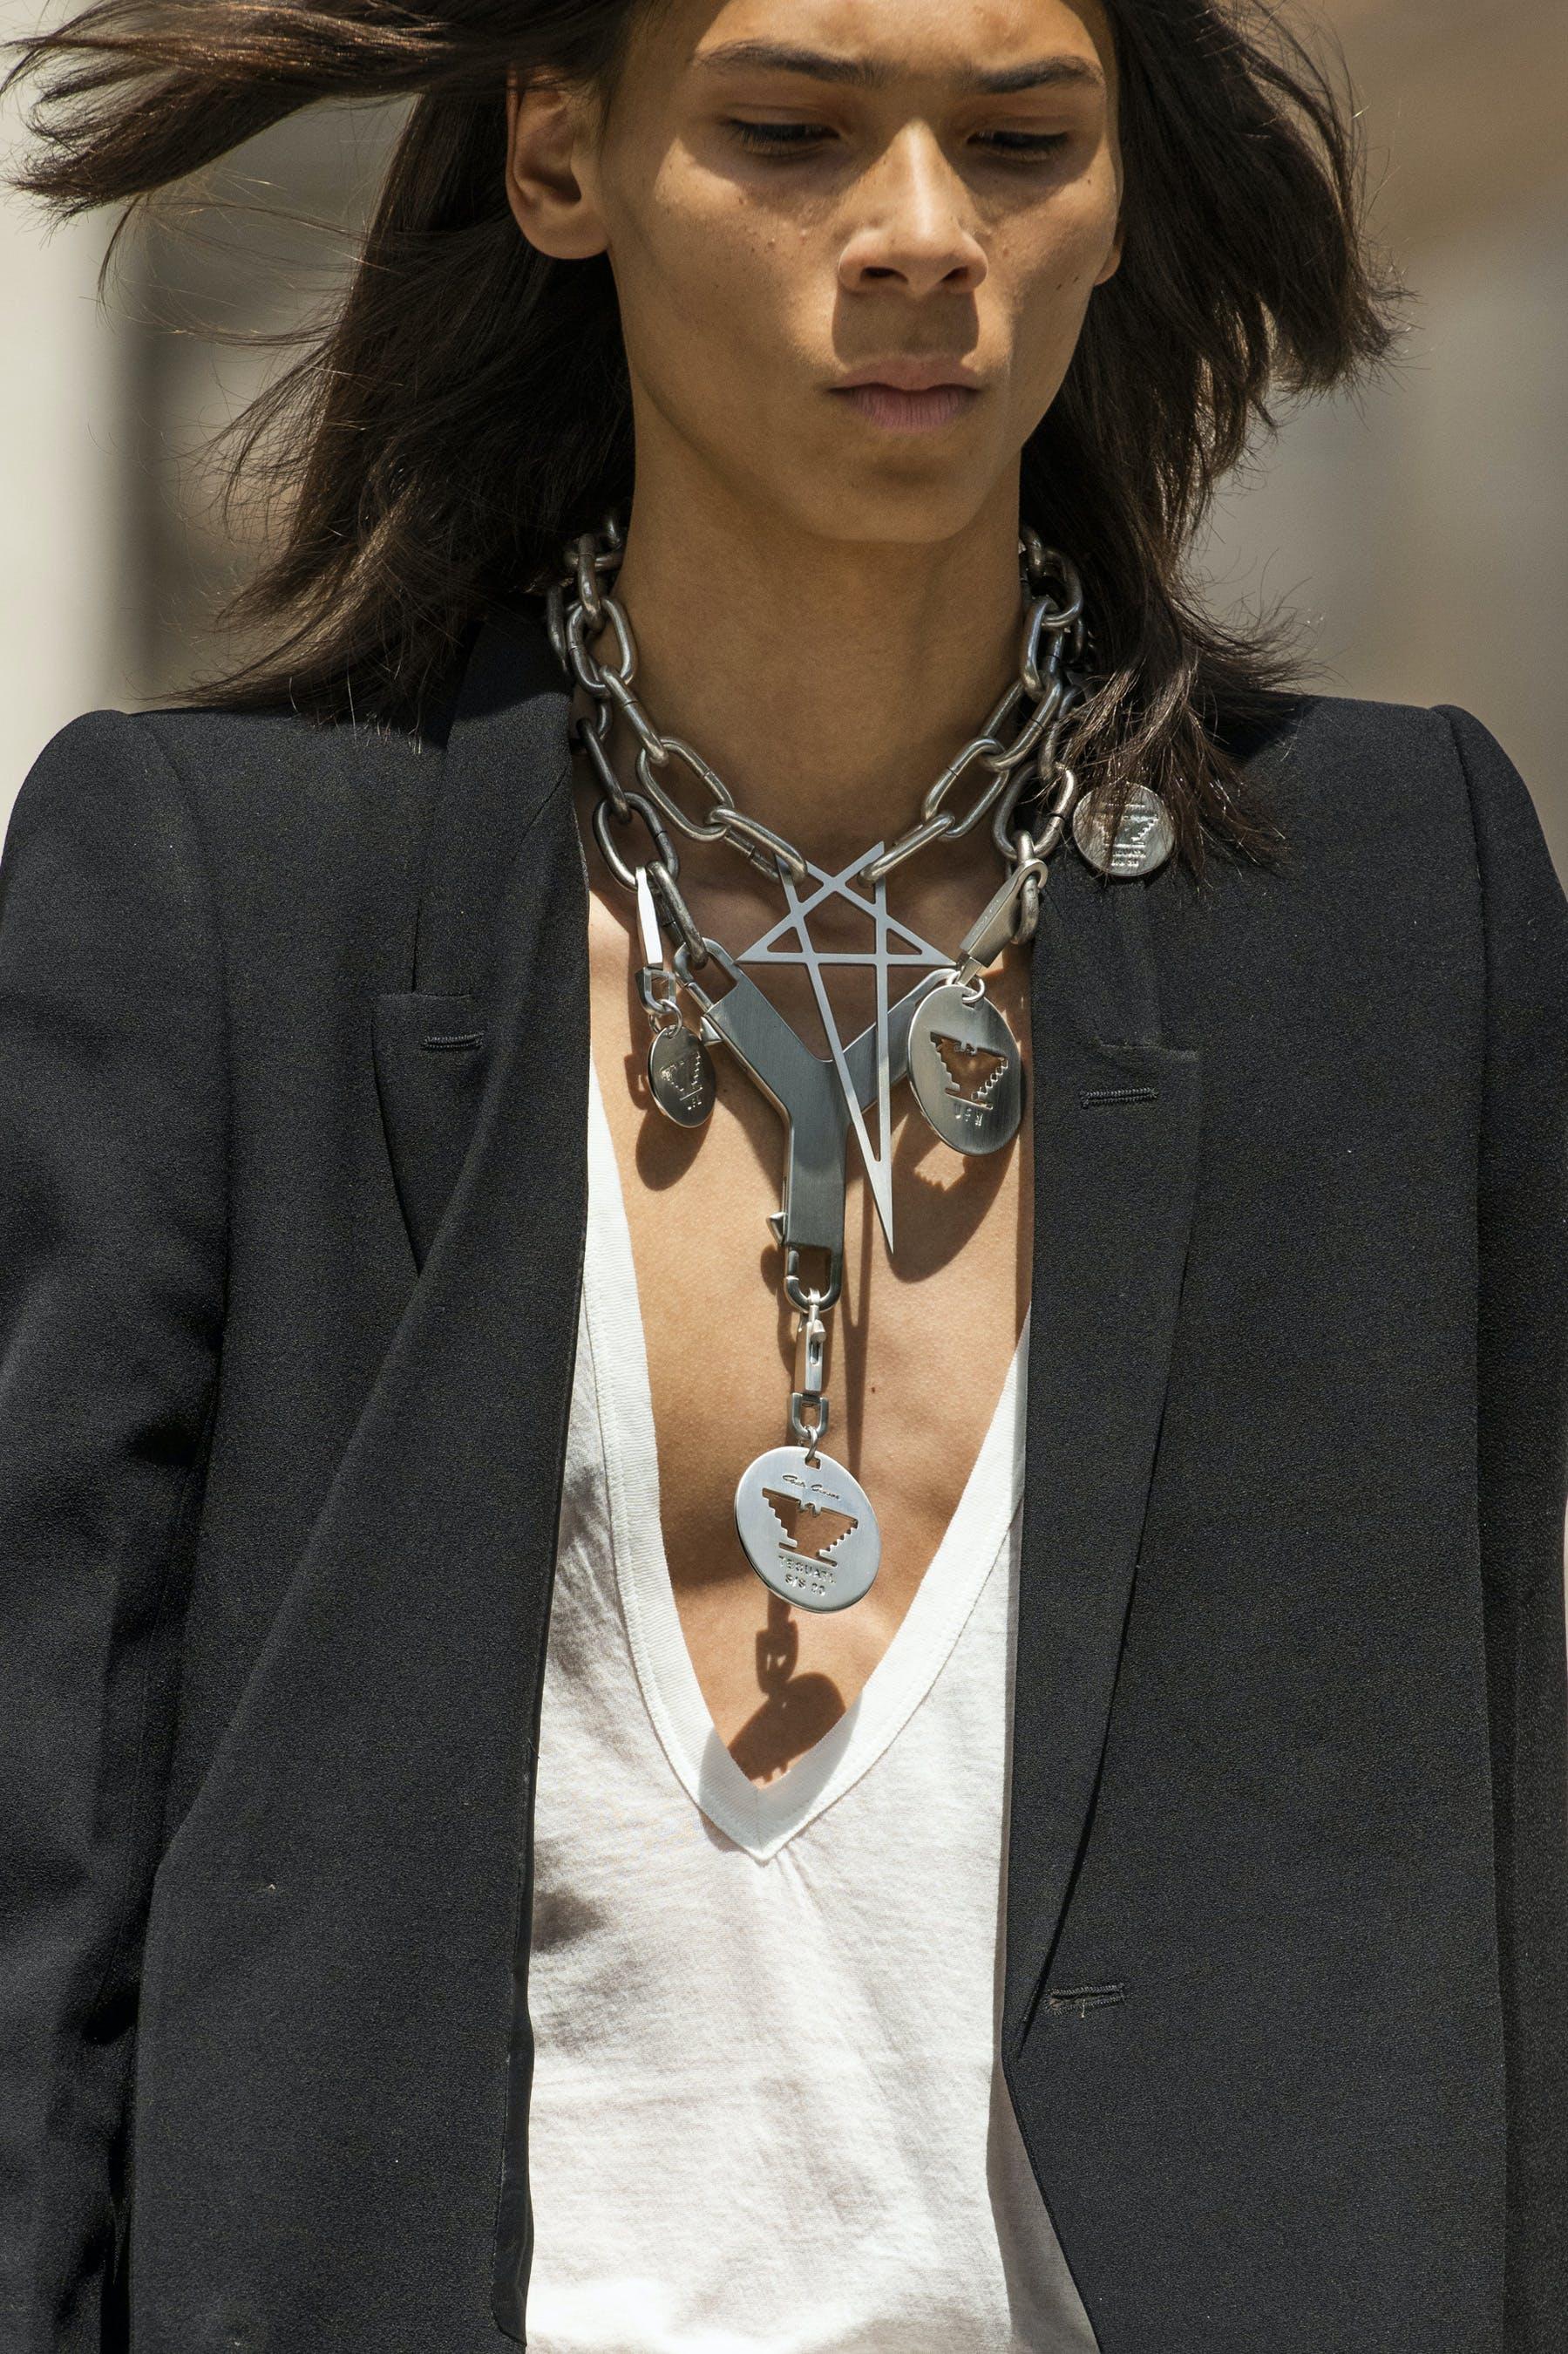 Rick Owens Runway Details Dog Chain Necklace Cerberus Key Chain Oversized Blazer In Black White V Neck Shirt Mens SS20 Tecautl